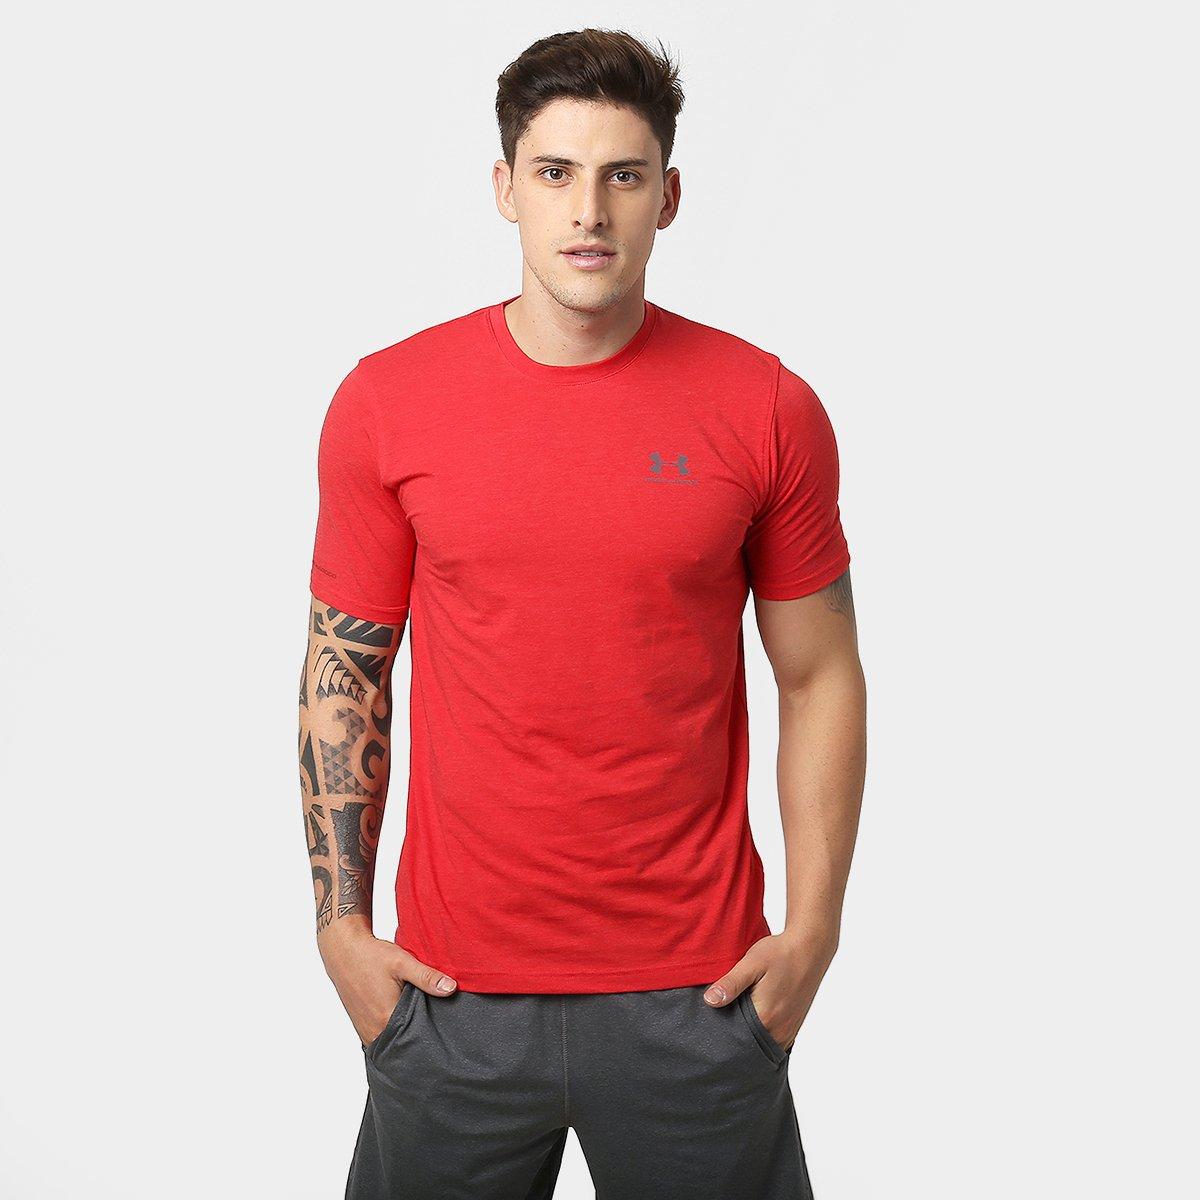 bc8510f8f85 Camiseta Under Armour Left Chest Lockup Masculina - Compre Agora ...